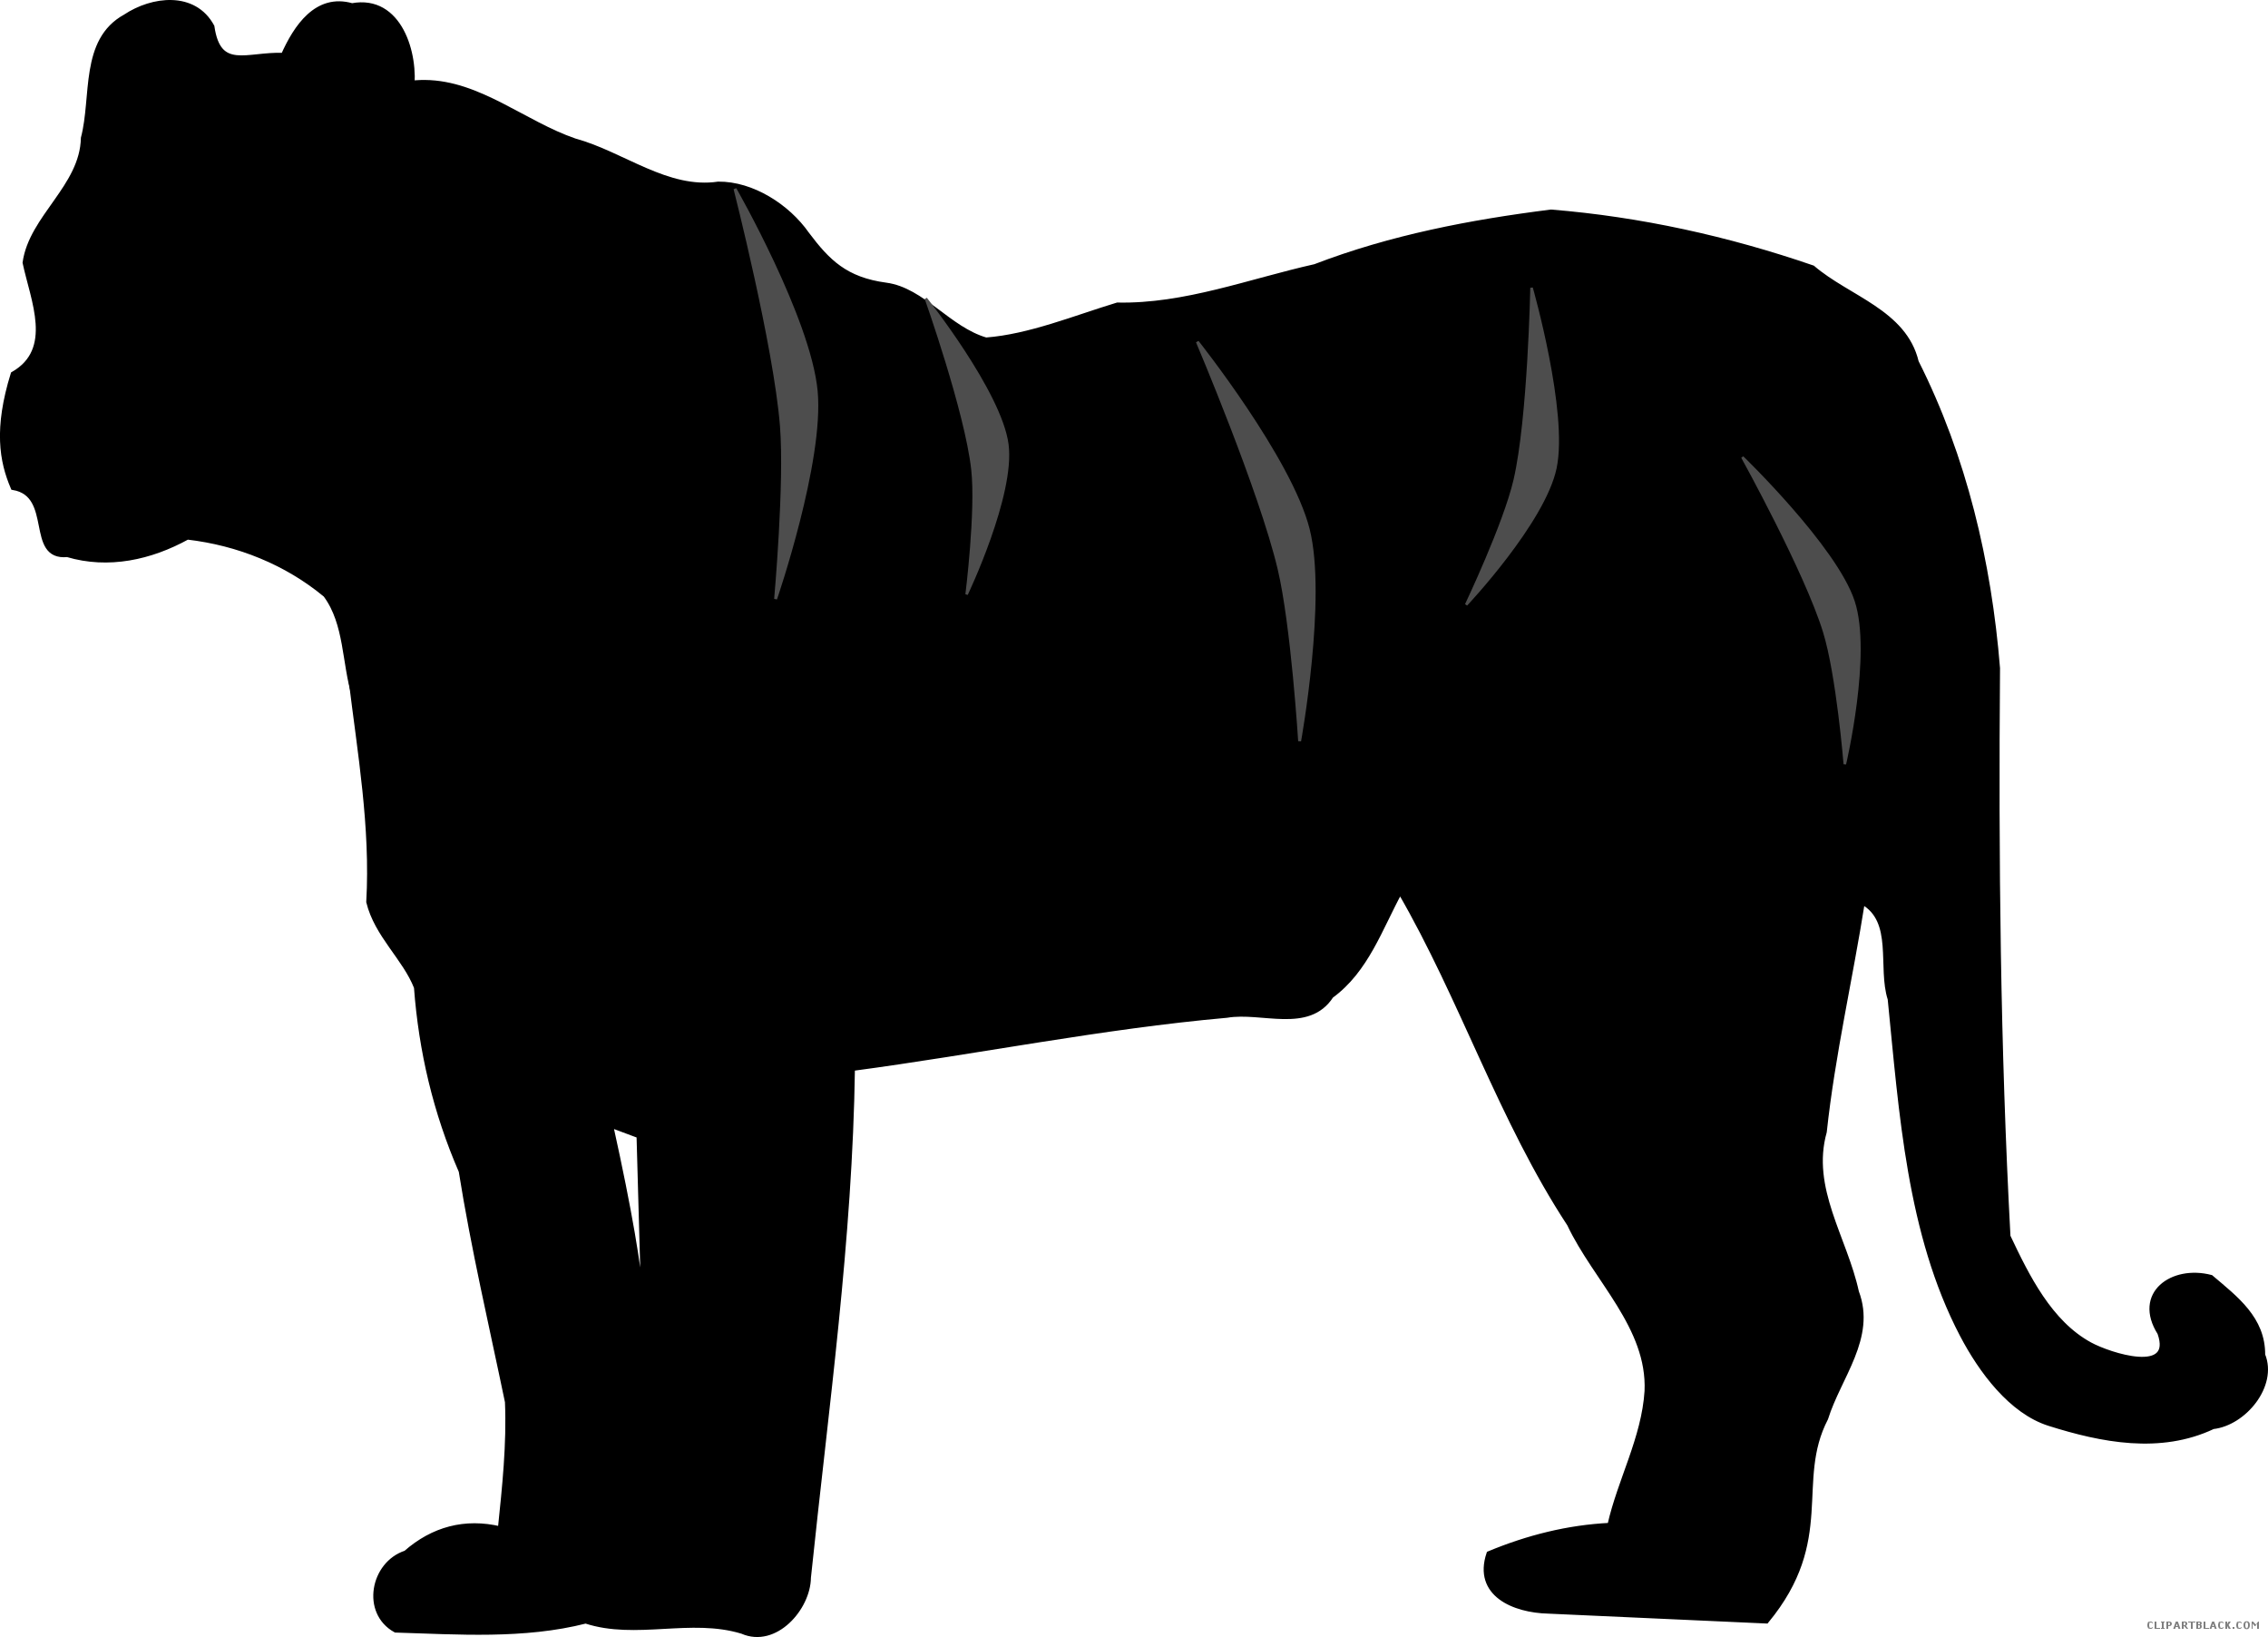 Turkey silhouette clipart cute graphic free stock Tiger Silhouette Clipart - ClipartBlack.com graphic free stock